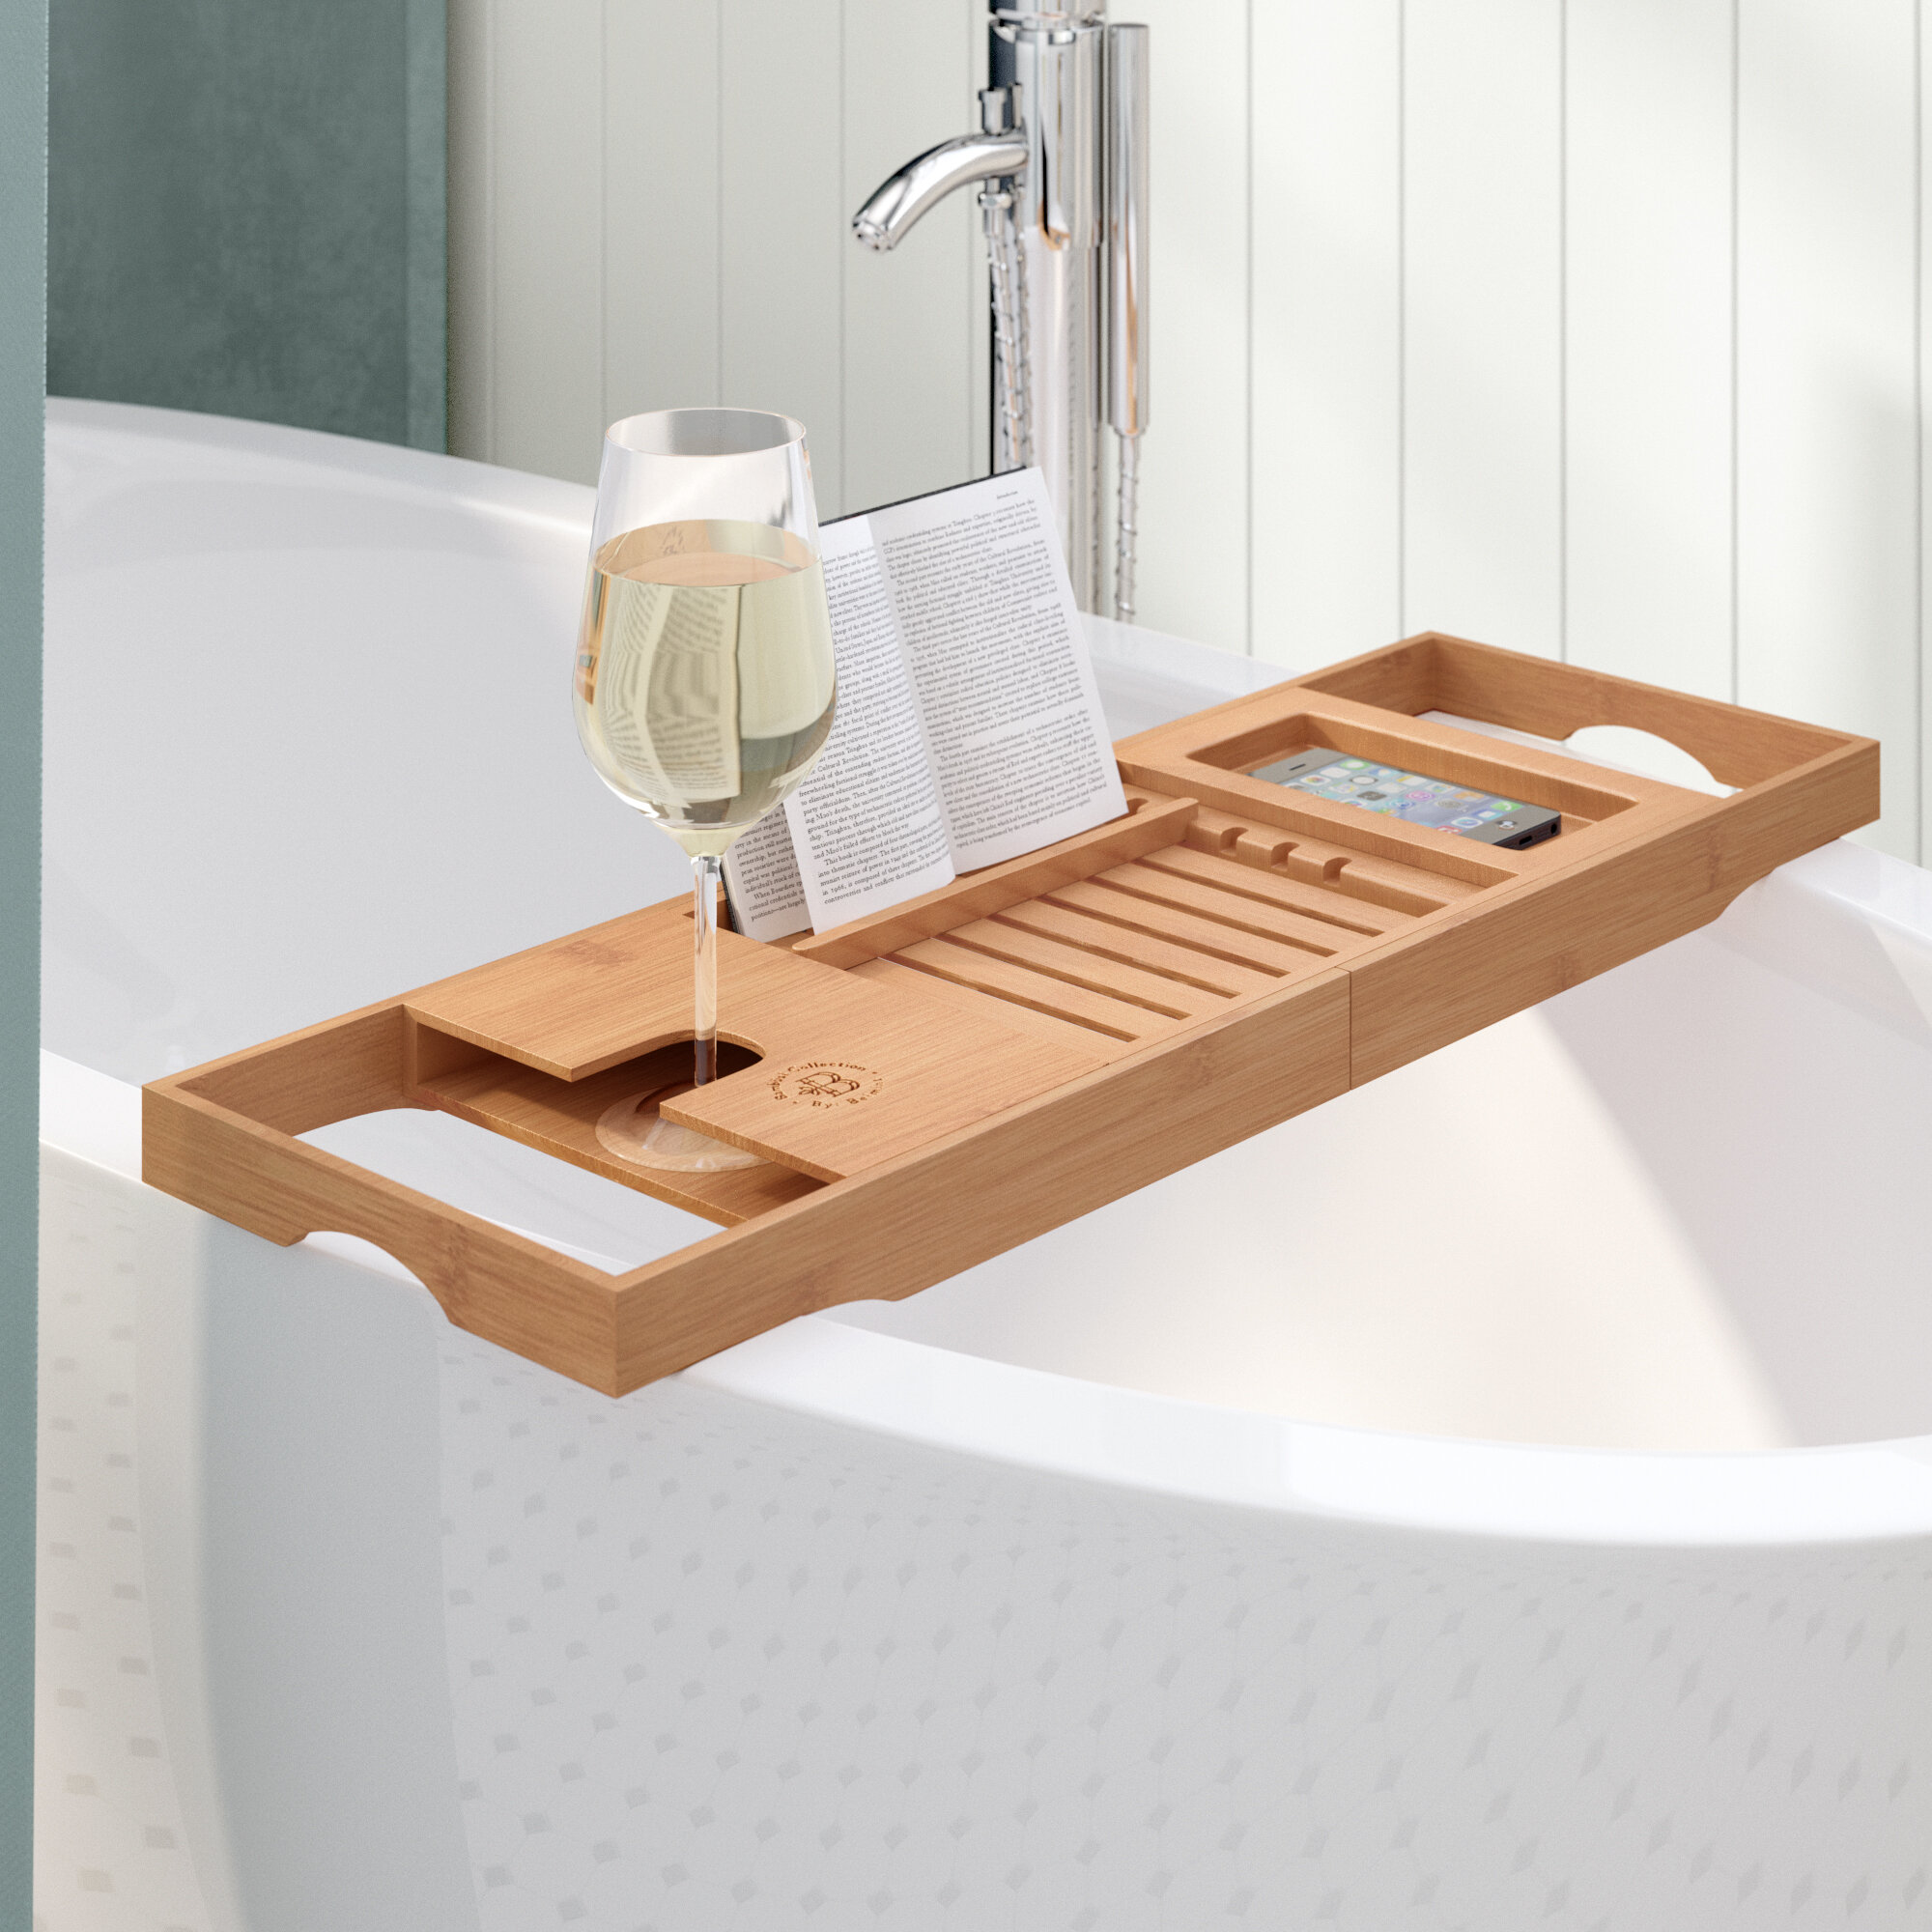 The Twillery Co. Elledge Bamboo Bath Caddy & Reviews | Wayfair